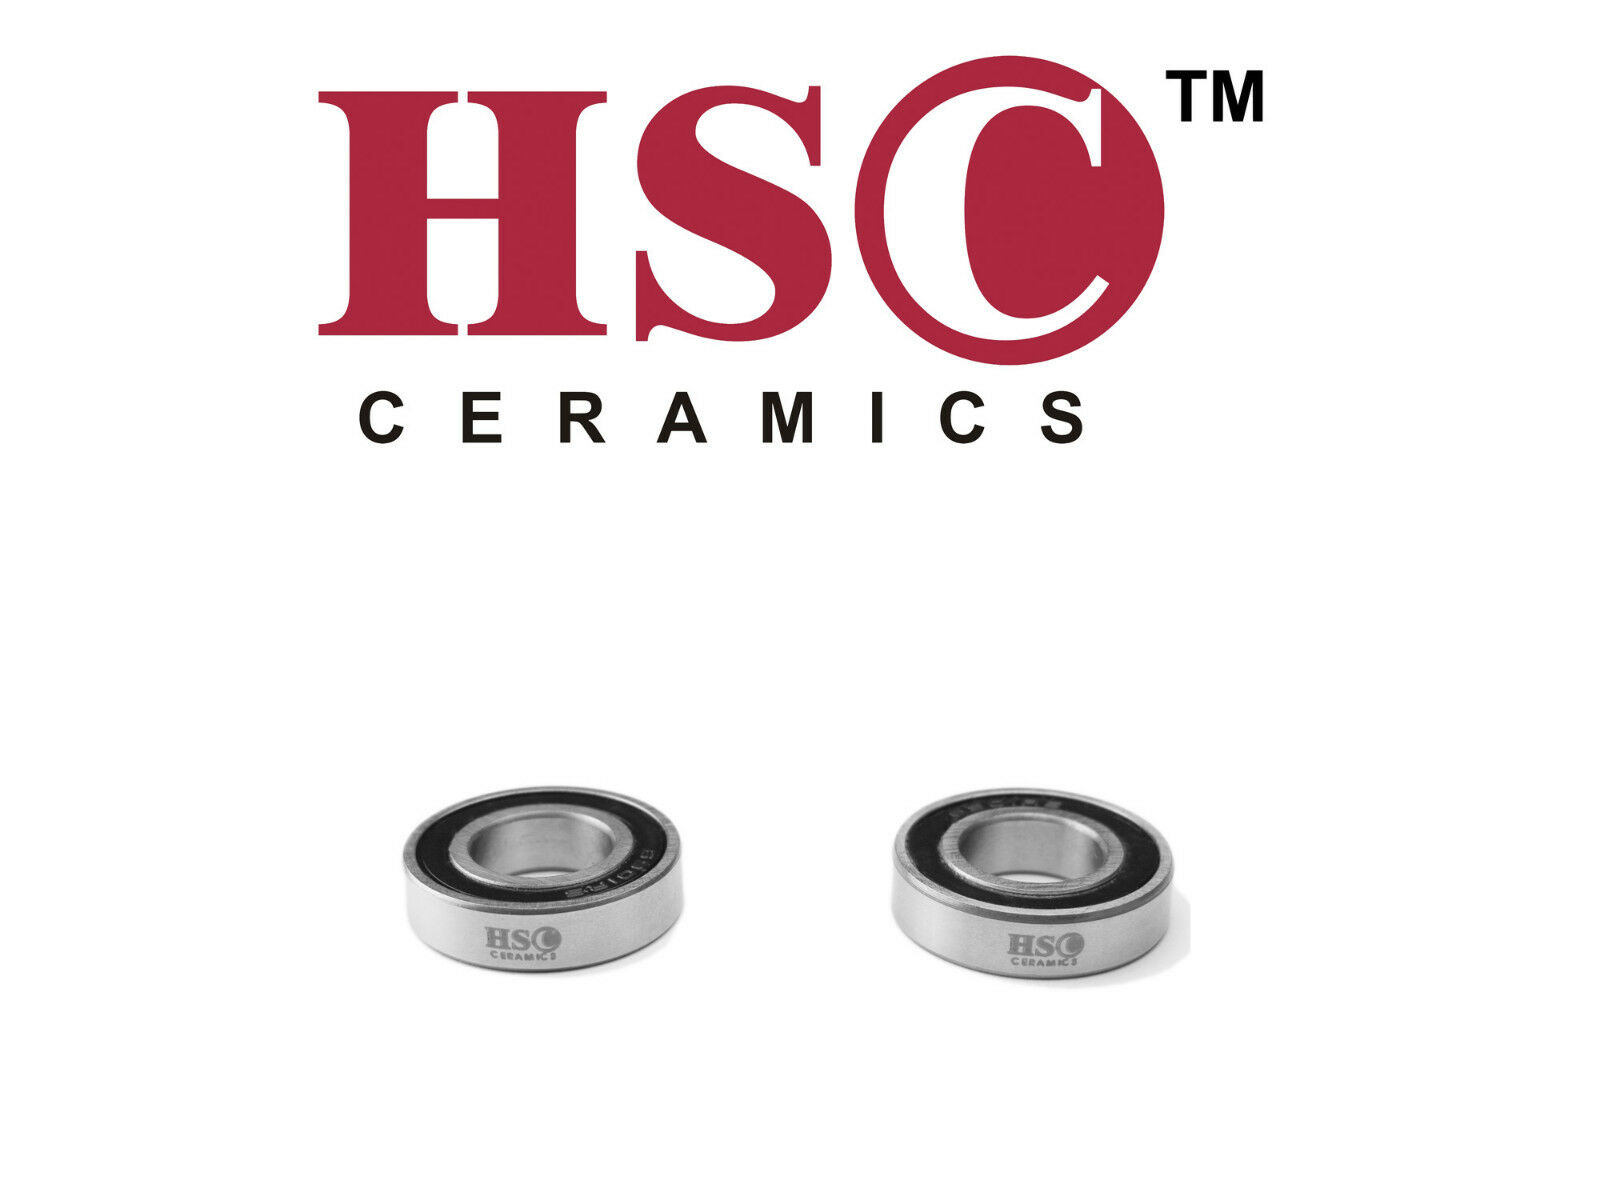 Campagnolo Freehub Ceramic Bearings (2x6803) for Campy/HG 9/11 - HSC Ceramics